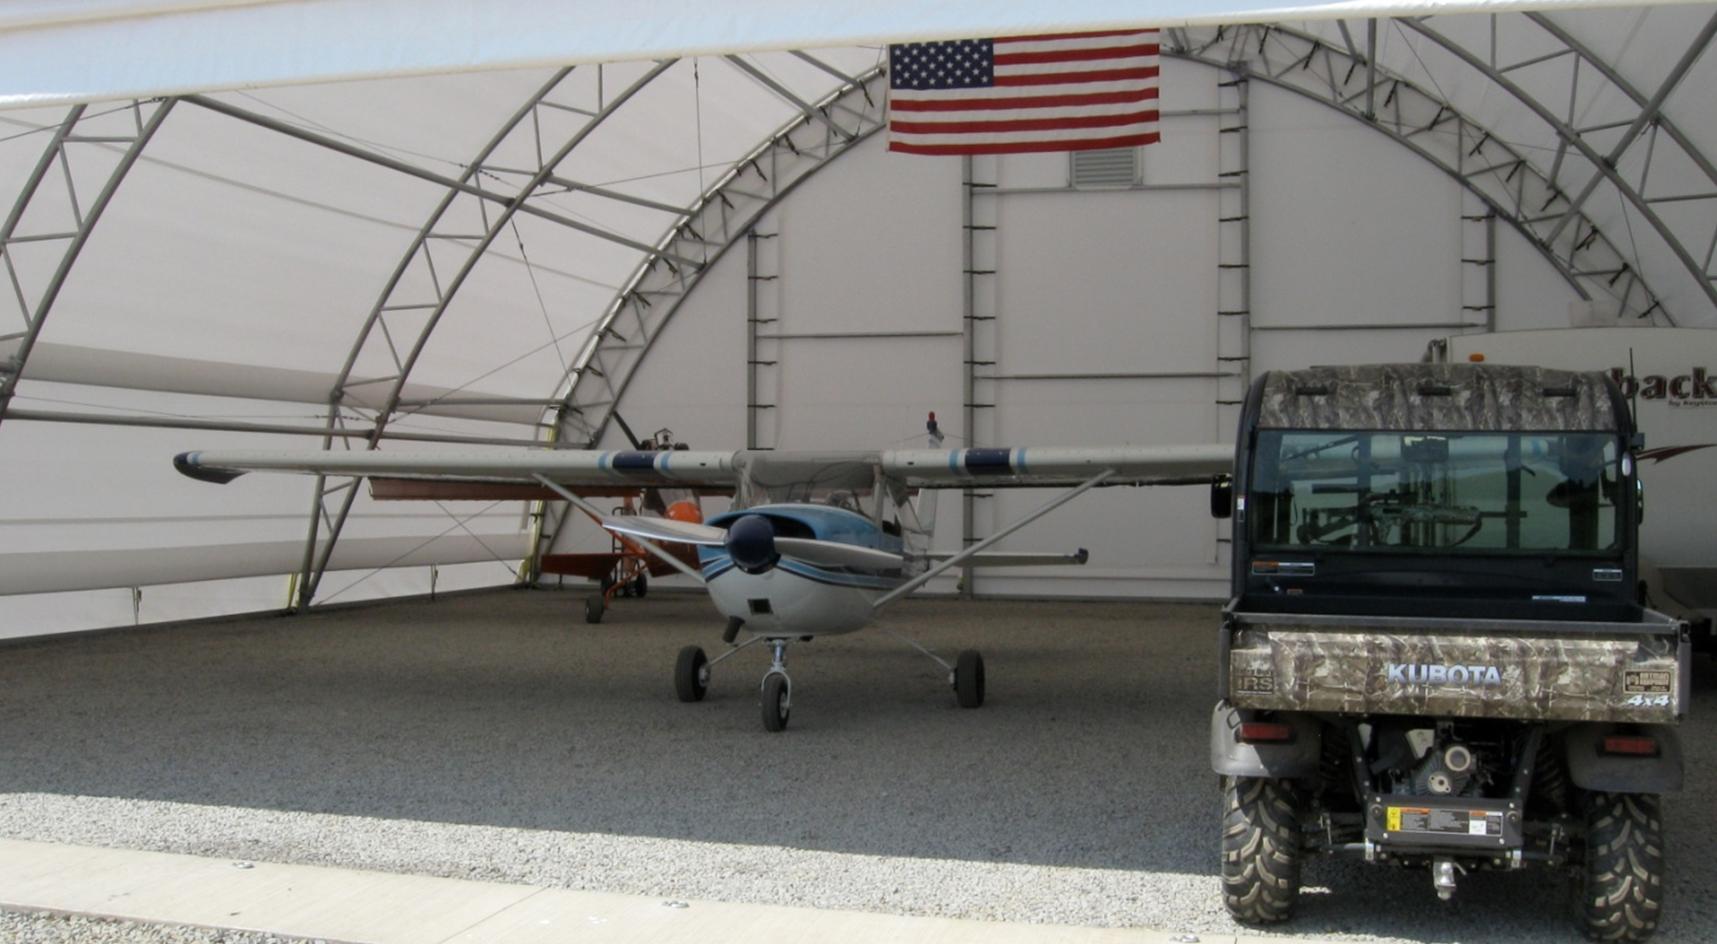 Aviation Storage for John Tevelonis American Flag hung inside